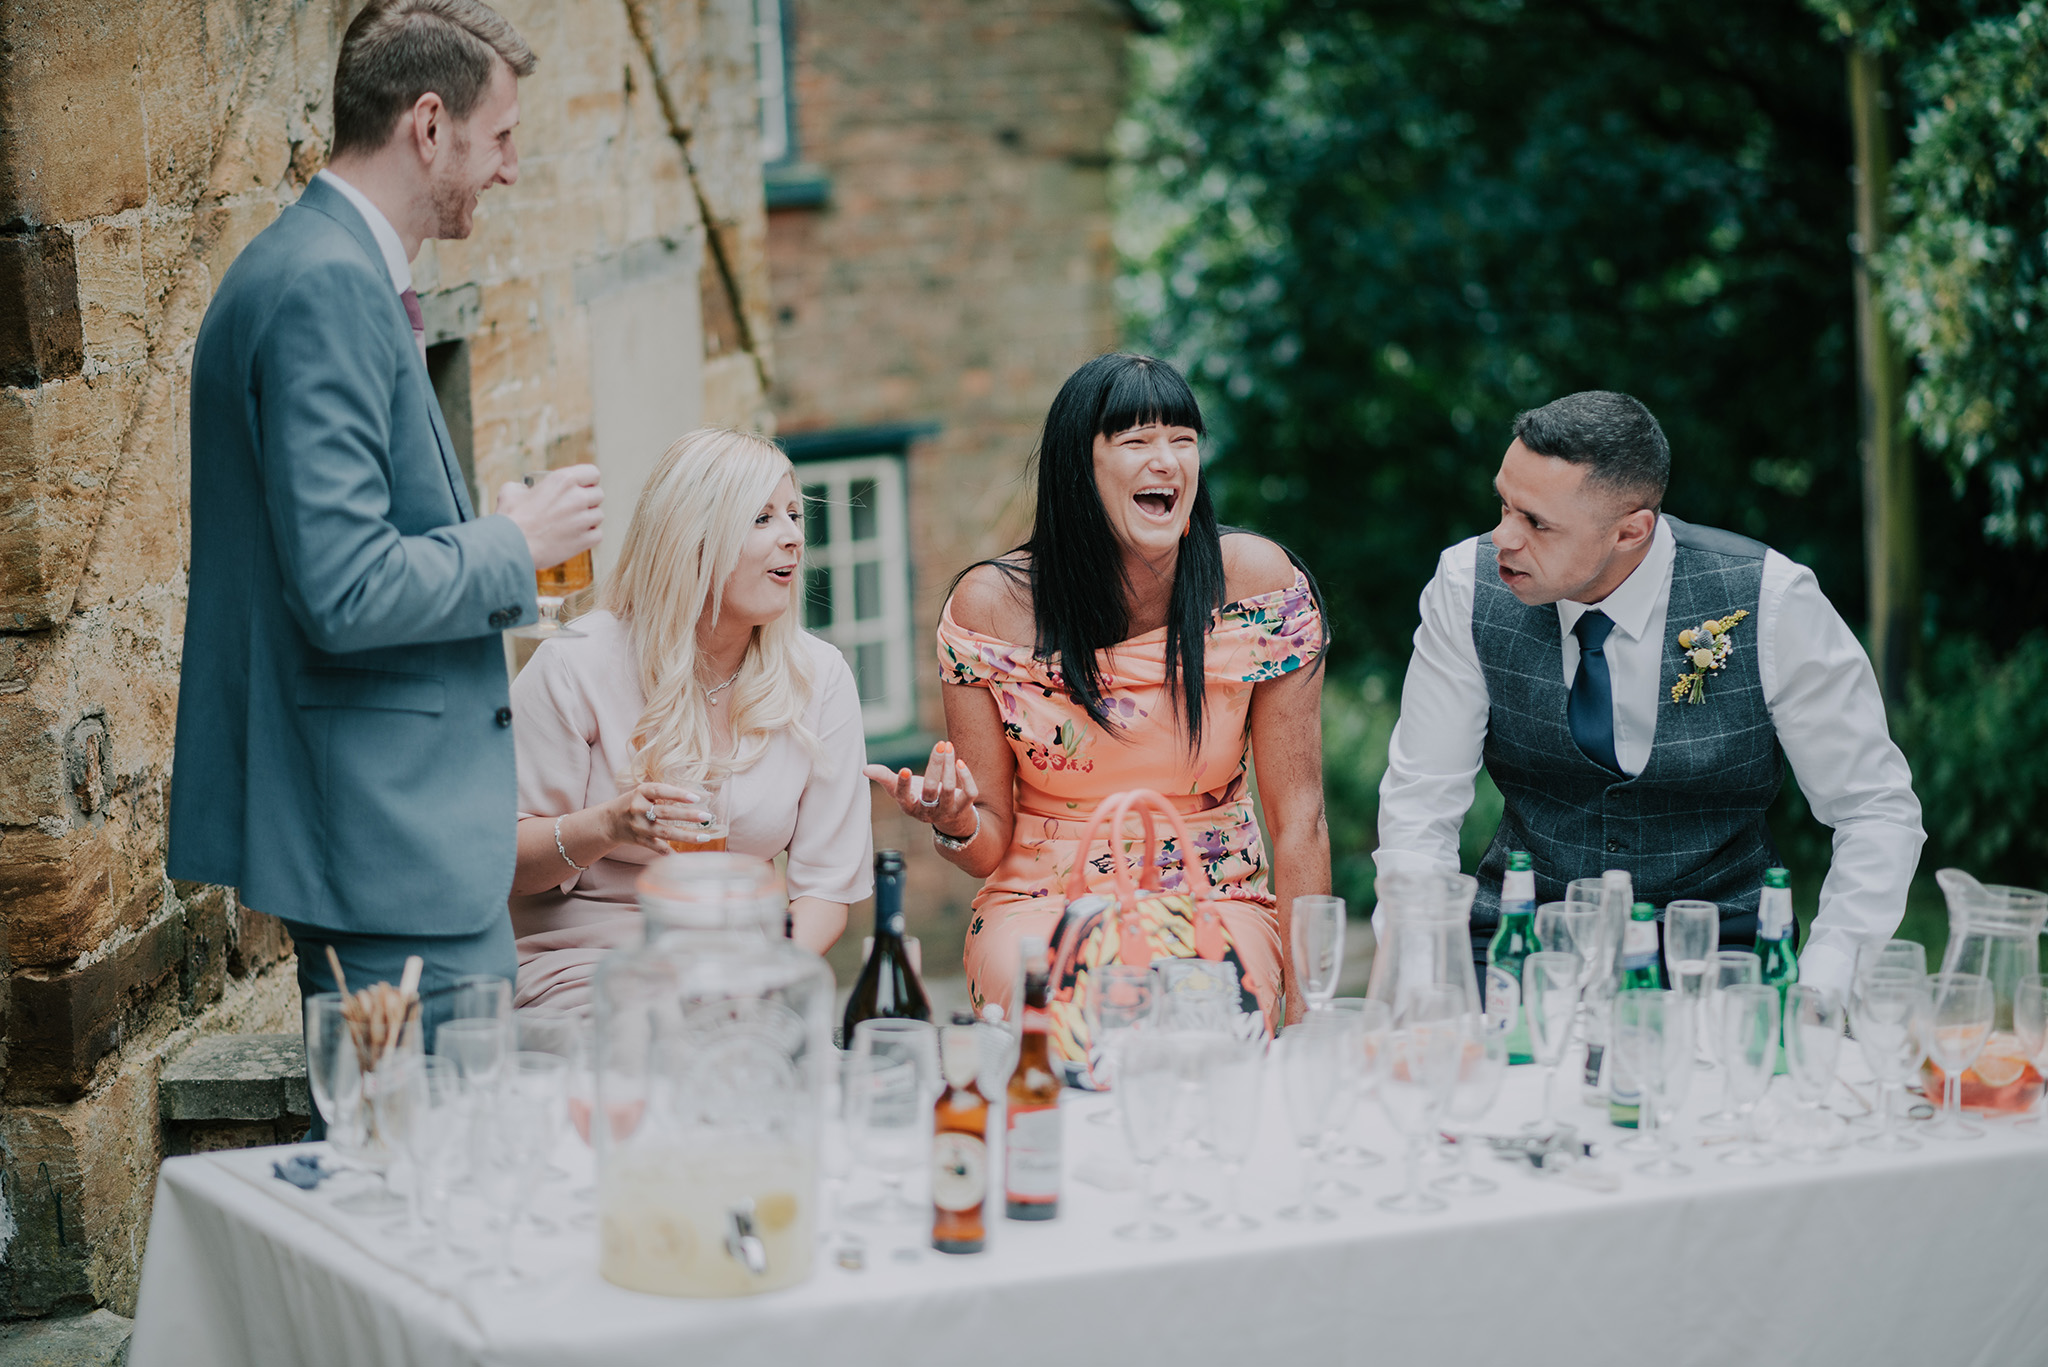 scott-stockwell-photography-wedding-44.jpg